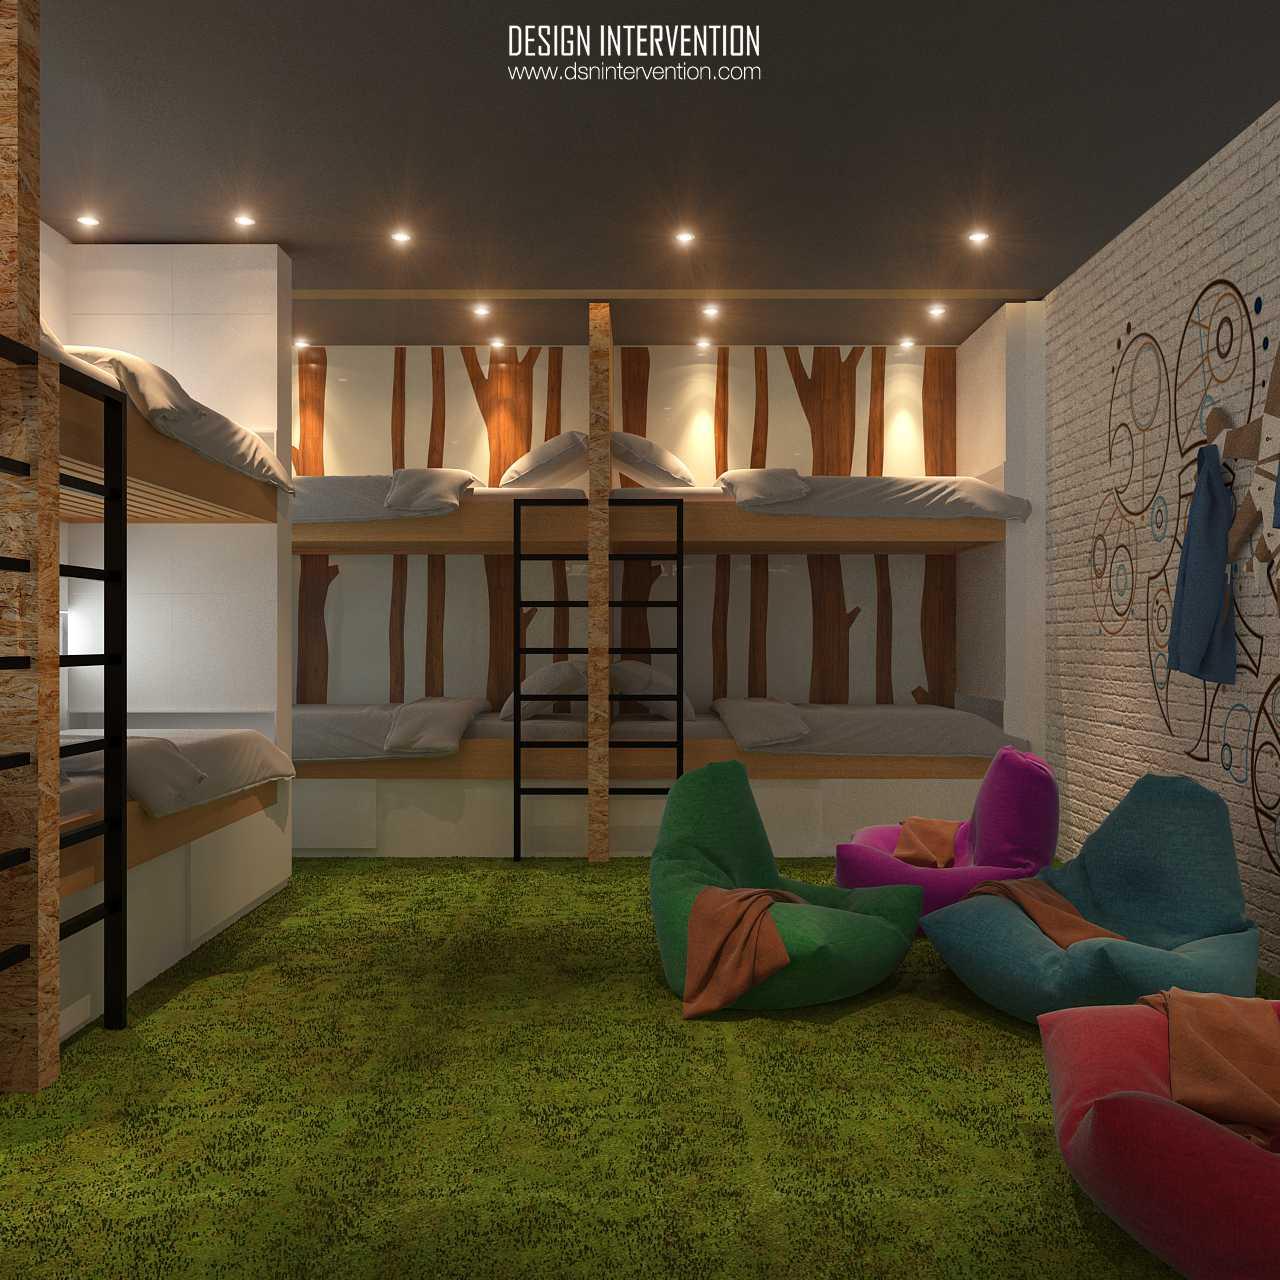 B Hostel karya Design Intervention (Sumber: arsitag.com)